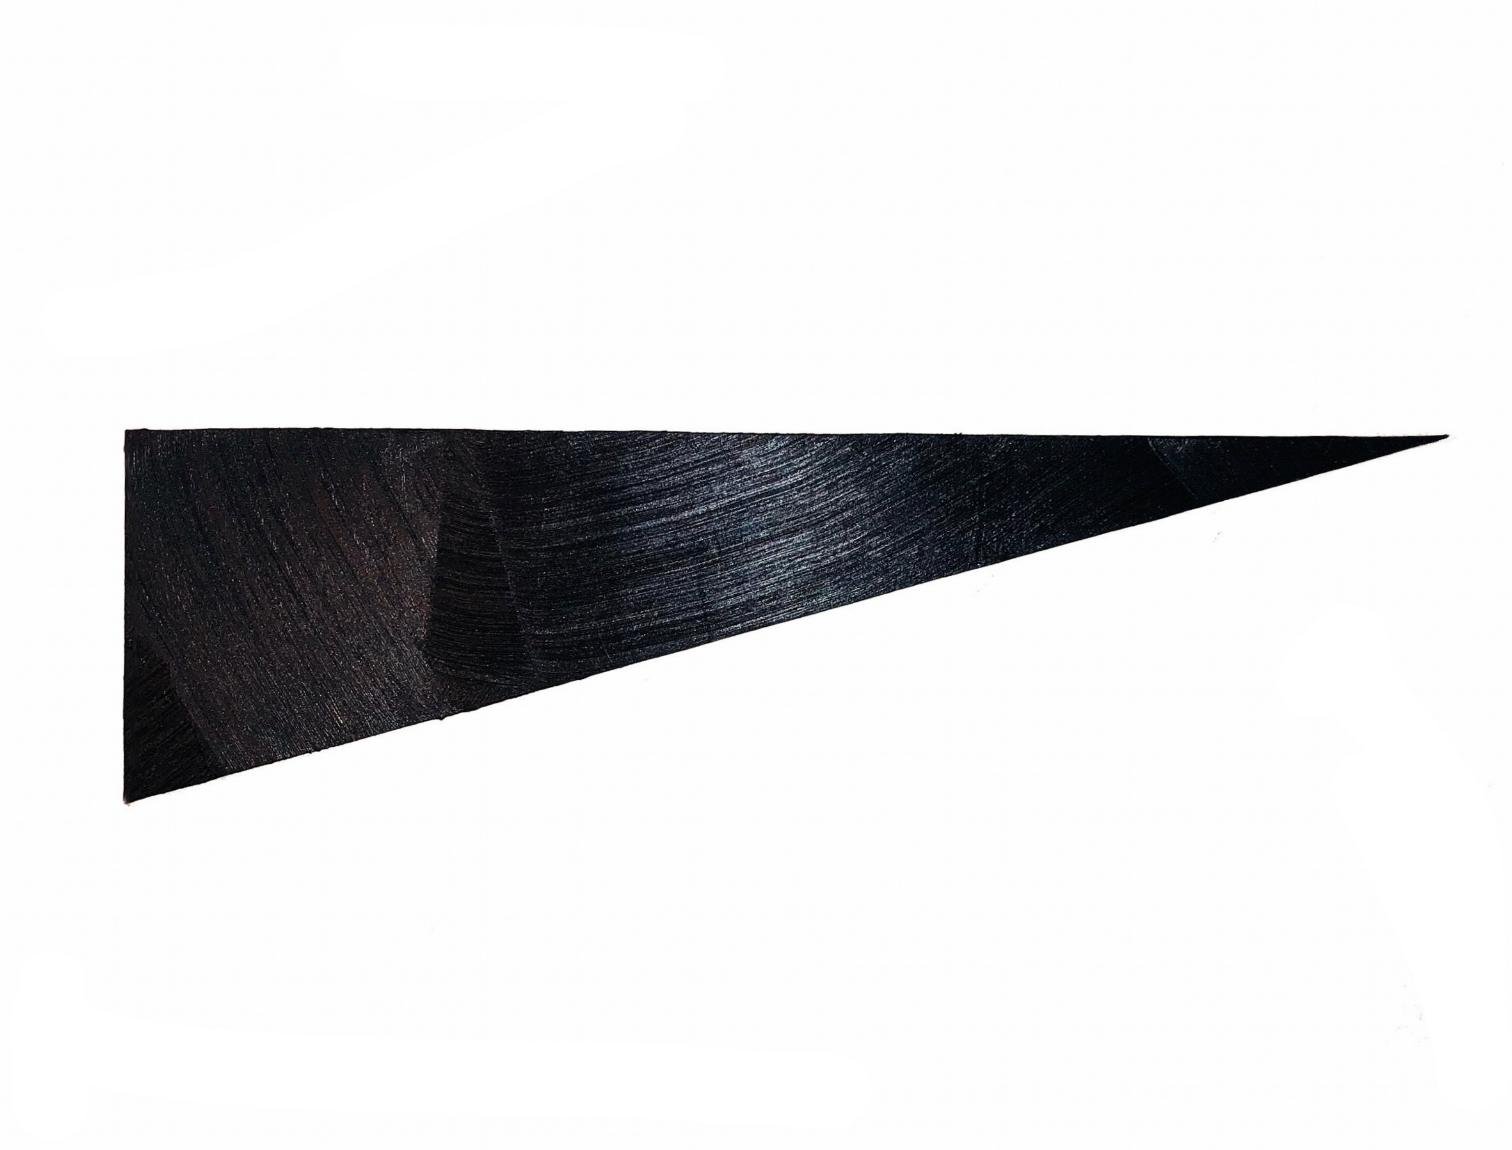 "18-02 acrylic on muslin over mdf 9.5"" x 33"" 2018"